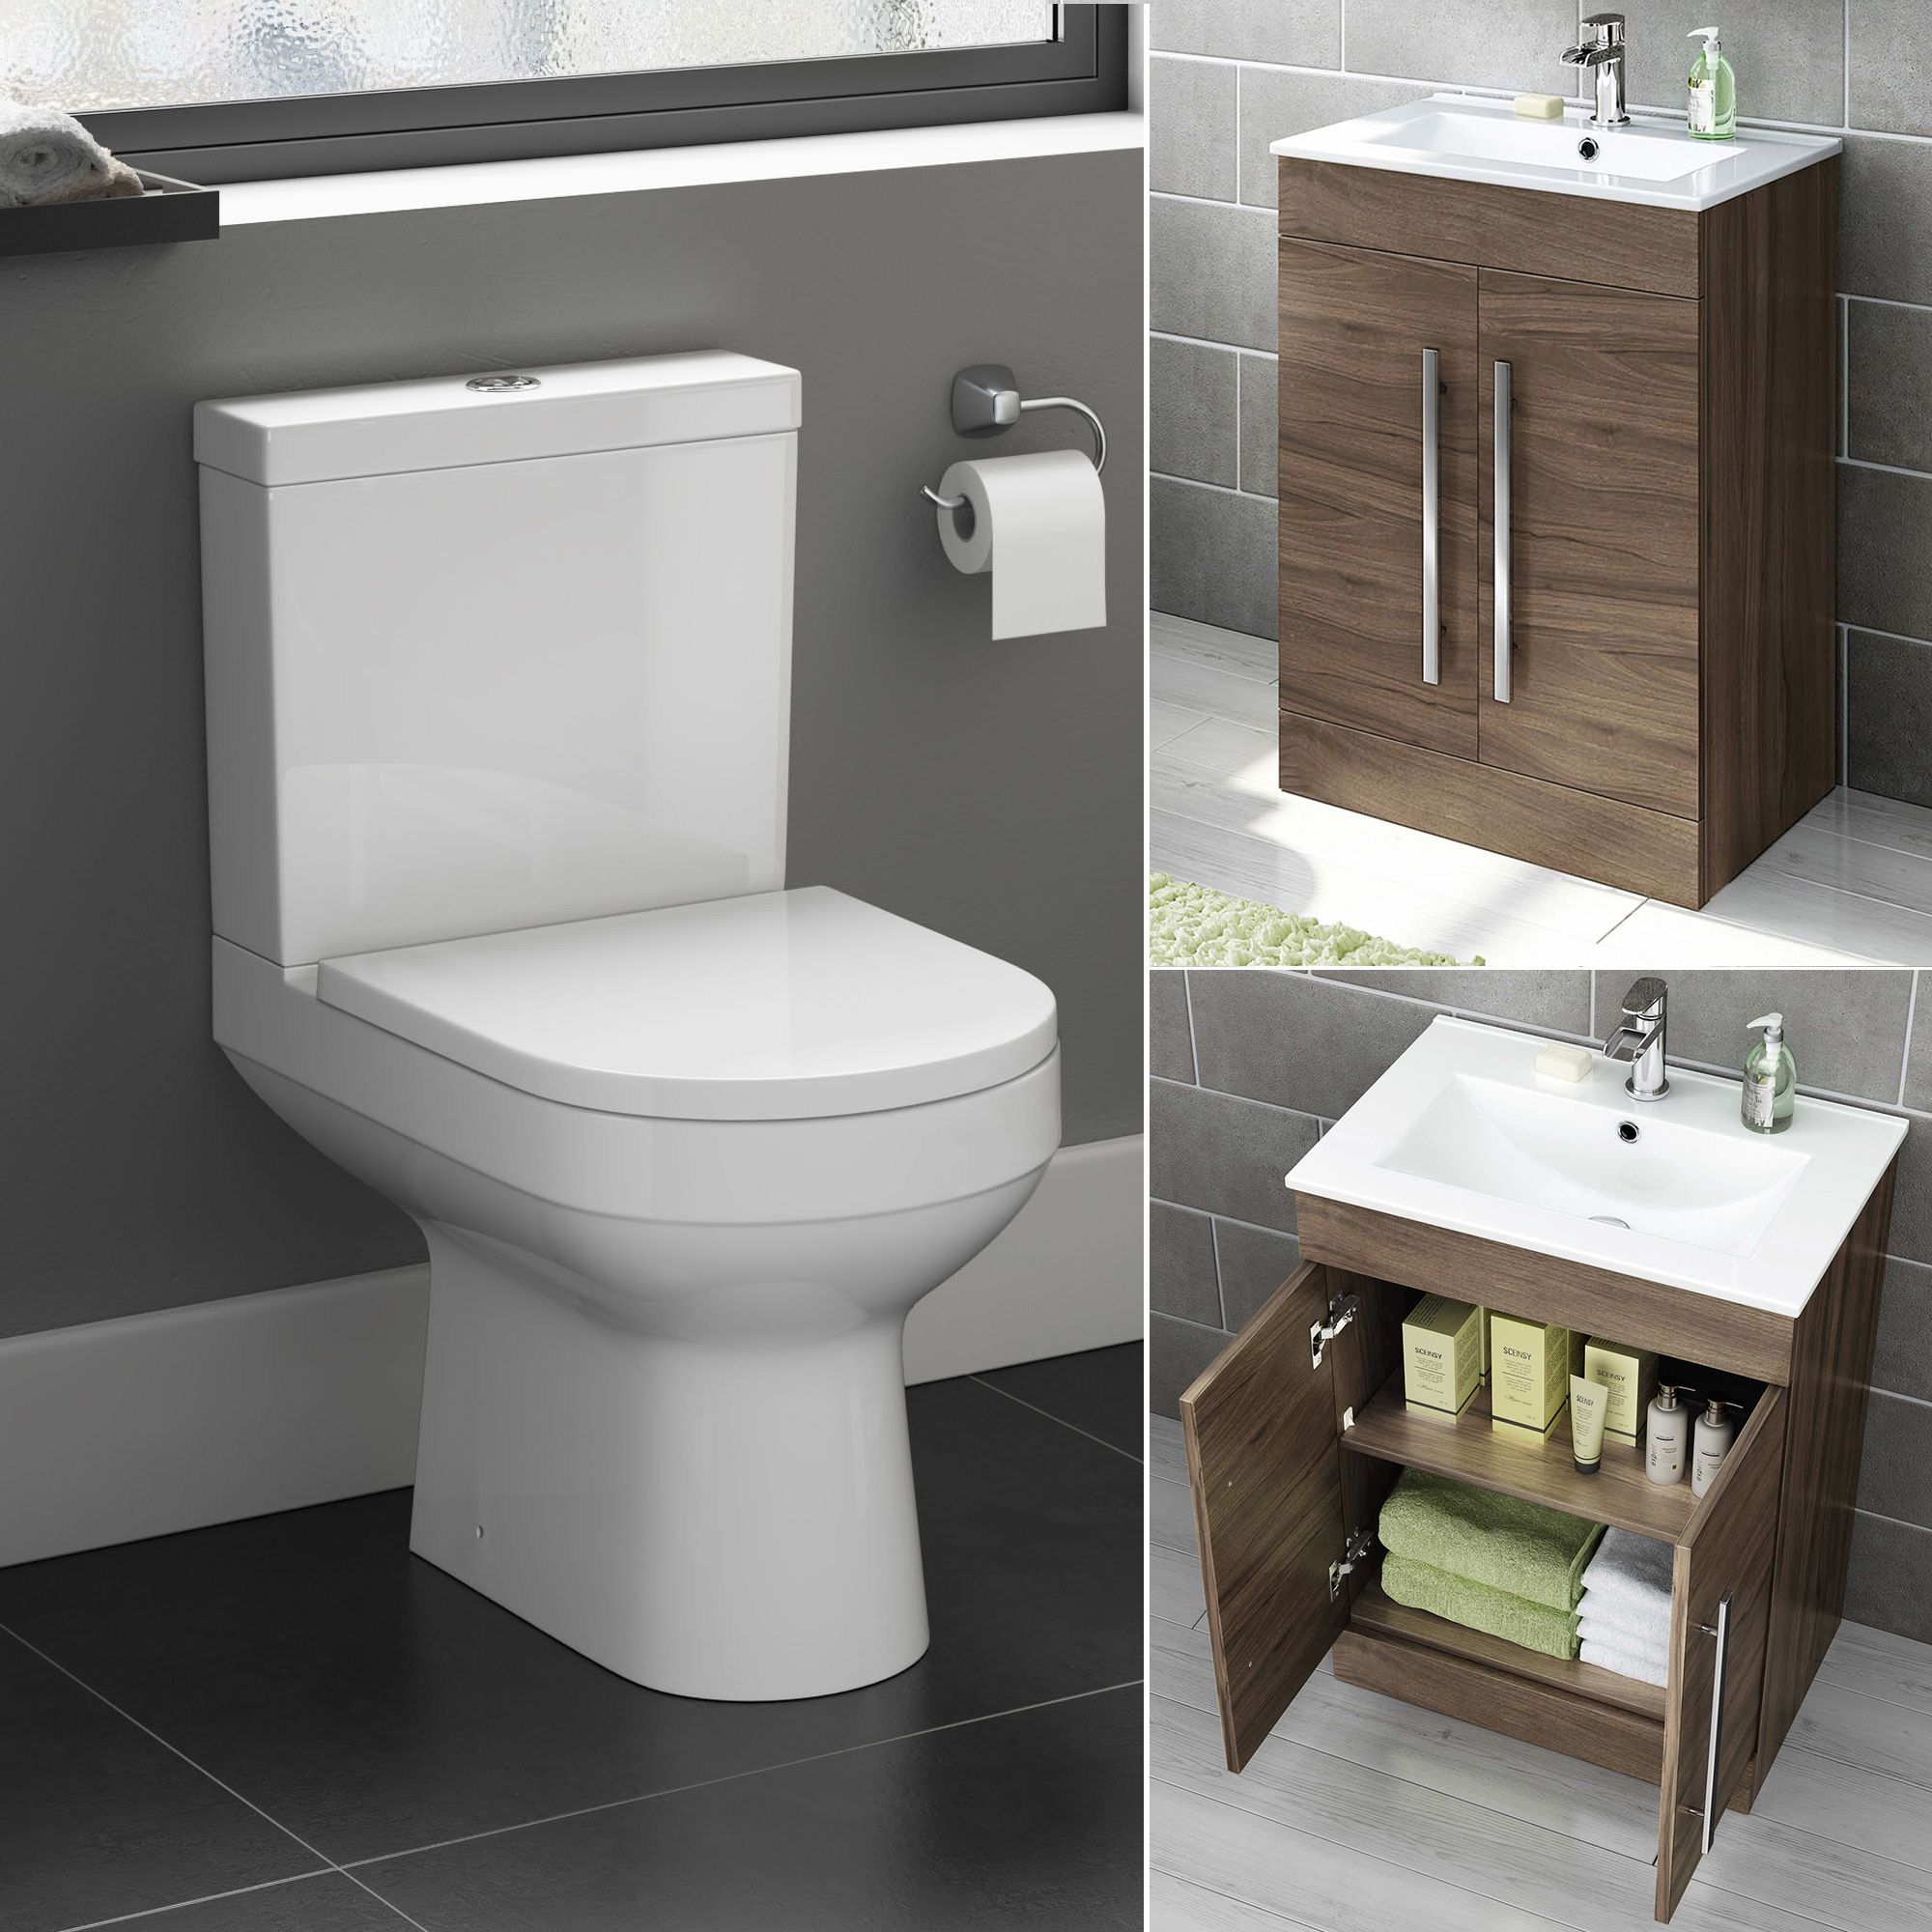 Close Coupled Toilet U0026 600mm Walnut Effect Basin Unit Set. ToiletsNext  DayBasinsAvonCabinets